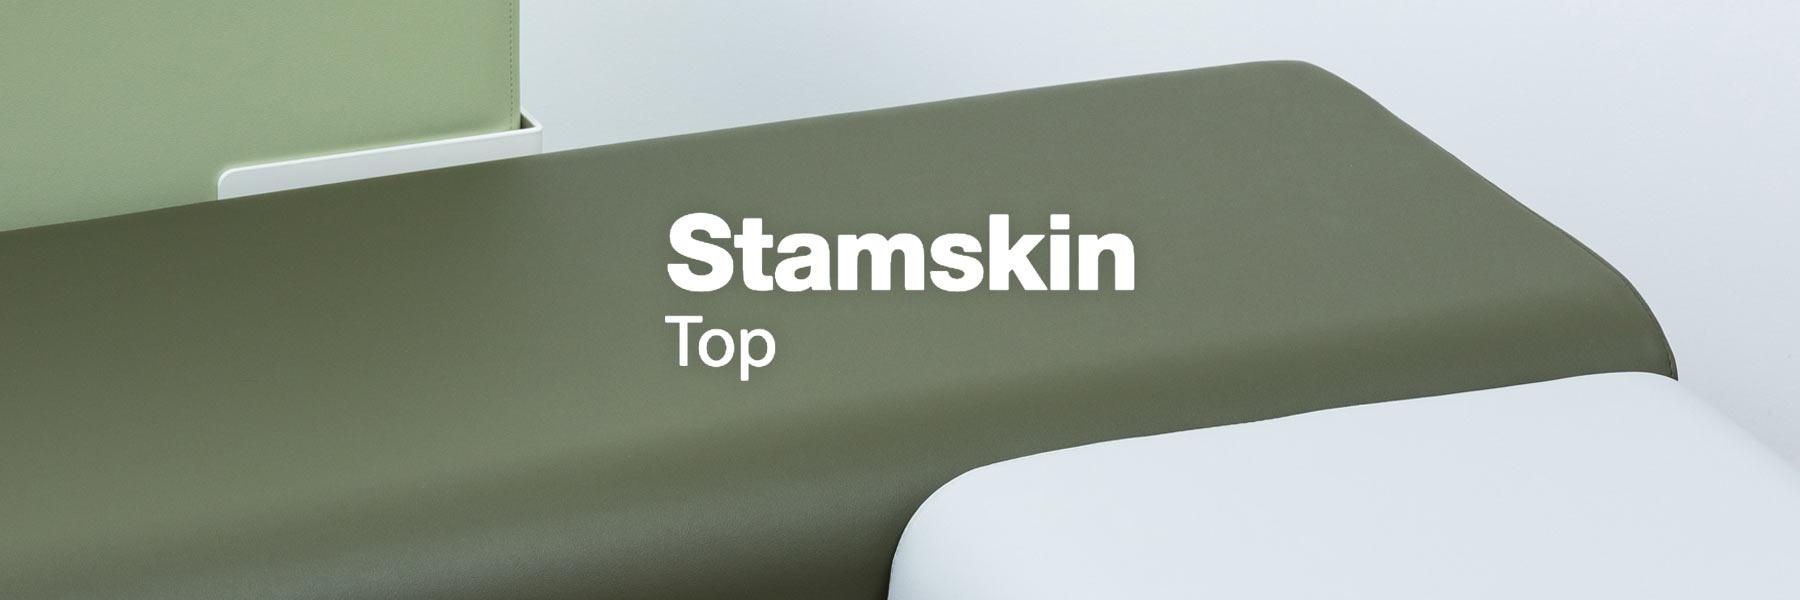 Serge Ferrari Stamskin Top header